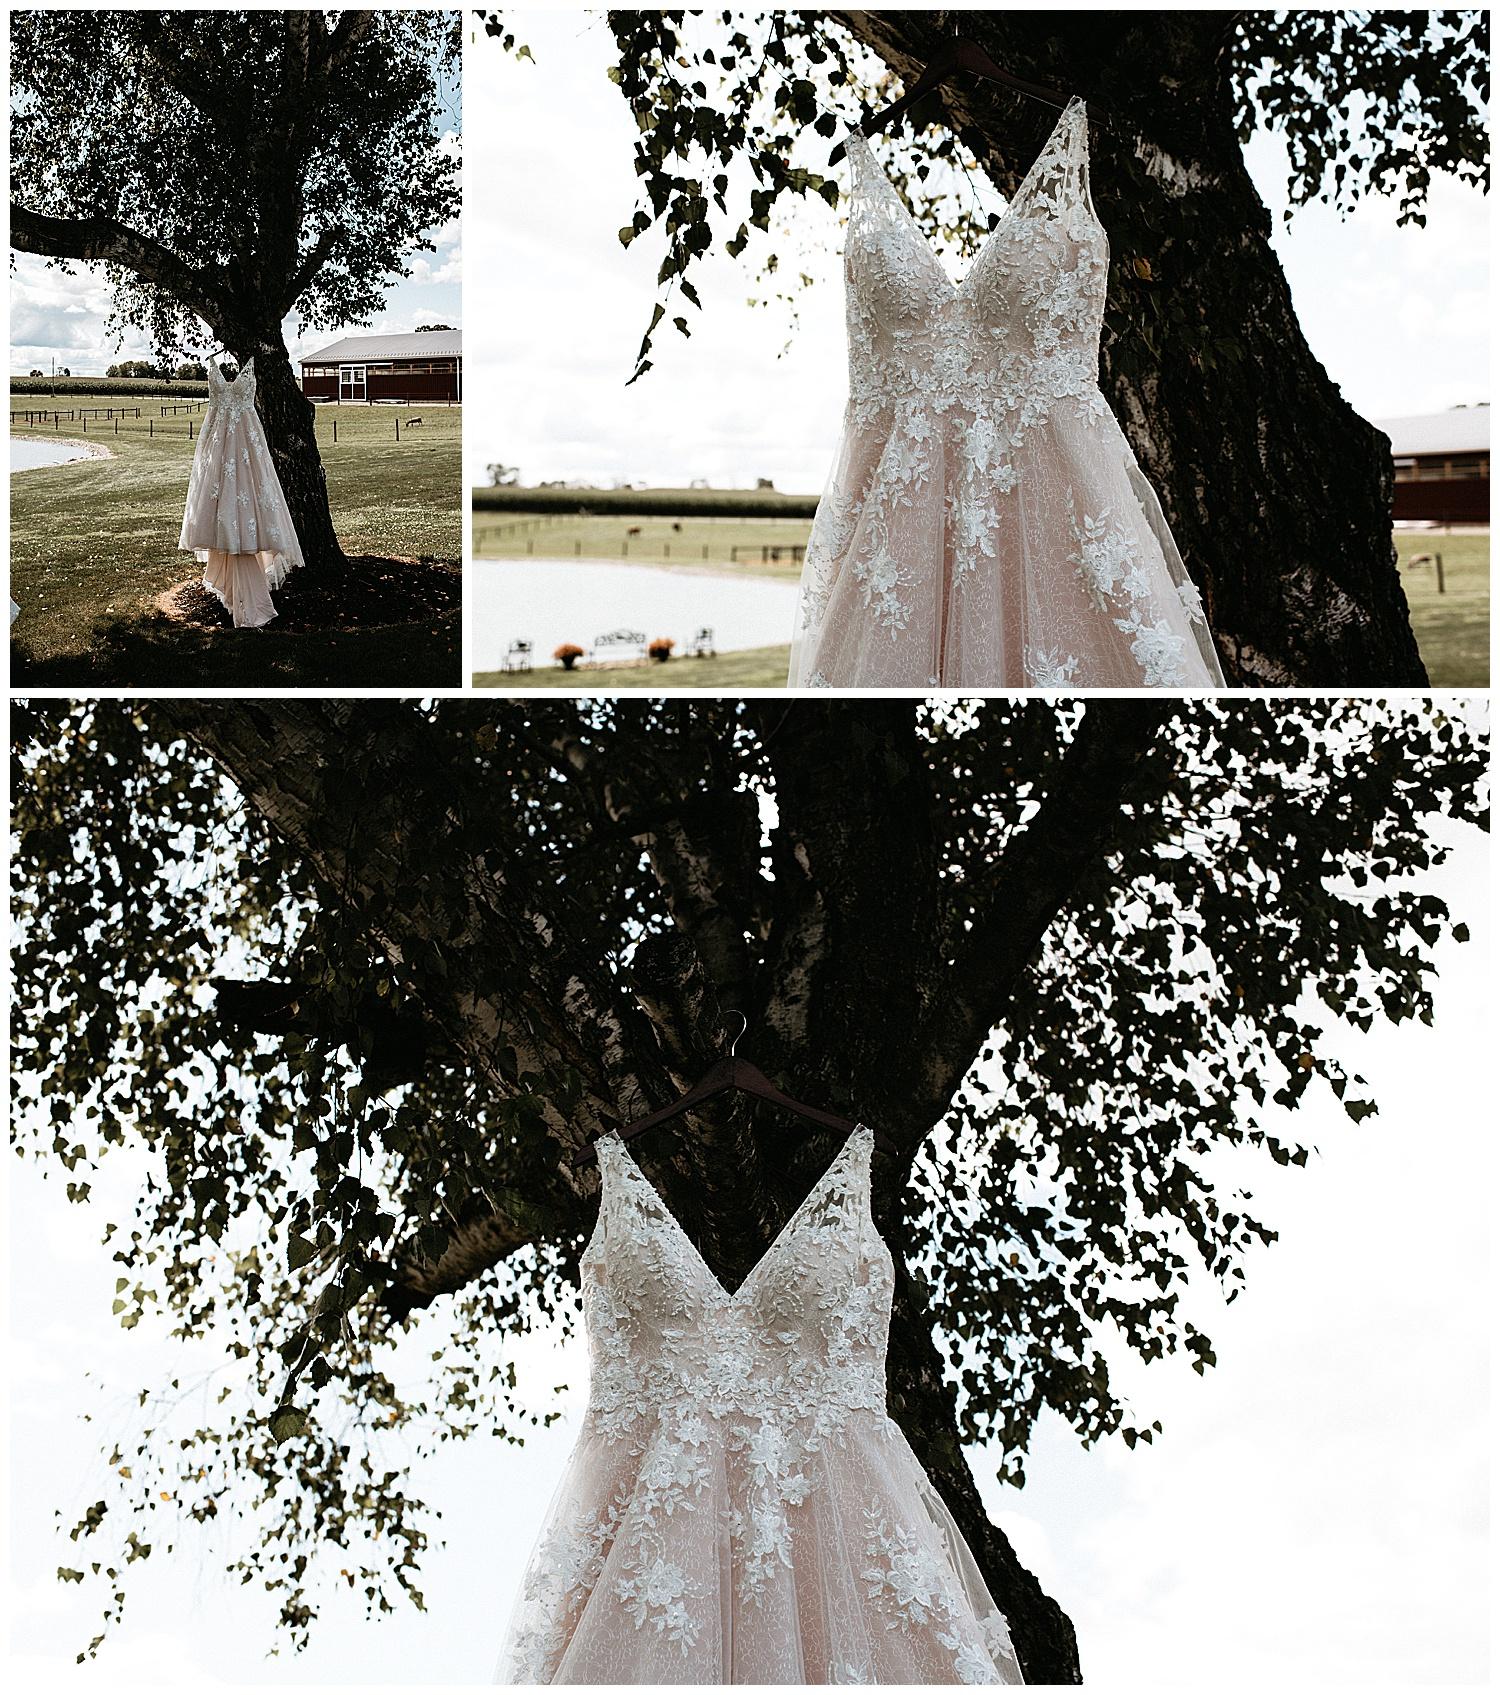 NEPA-Bloomgsburg-Wedding-Photographer-at-The-Barn-at-Greystone-Farms-Watsontown-PA_0005.jpg